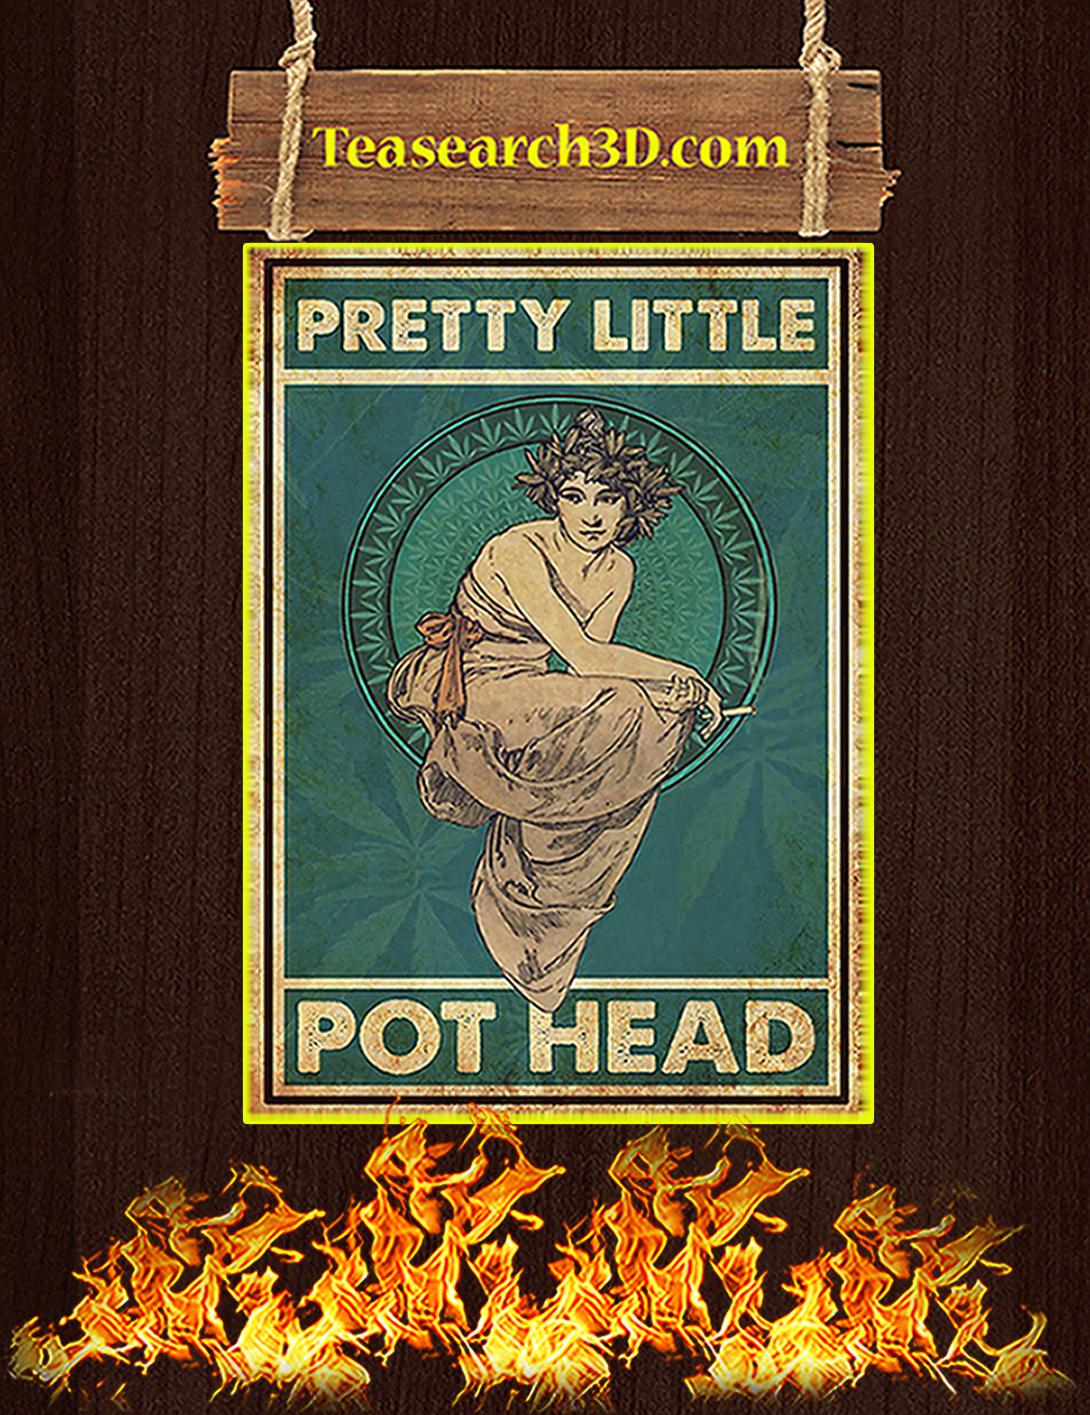 Pretty little pot head poster A2